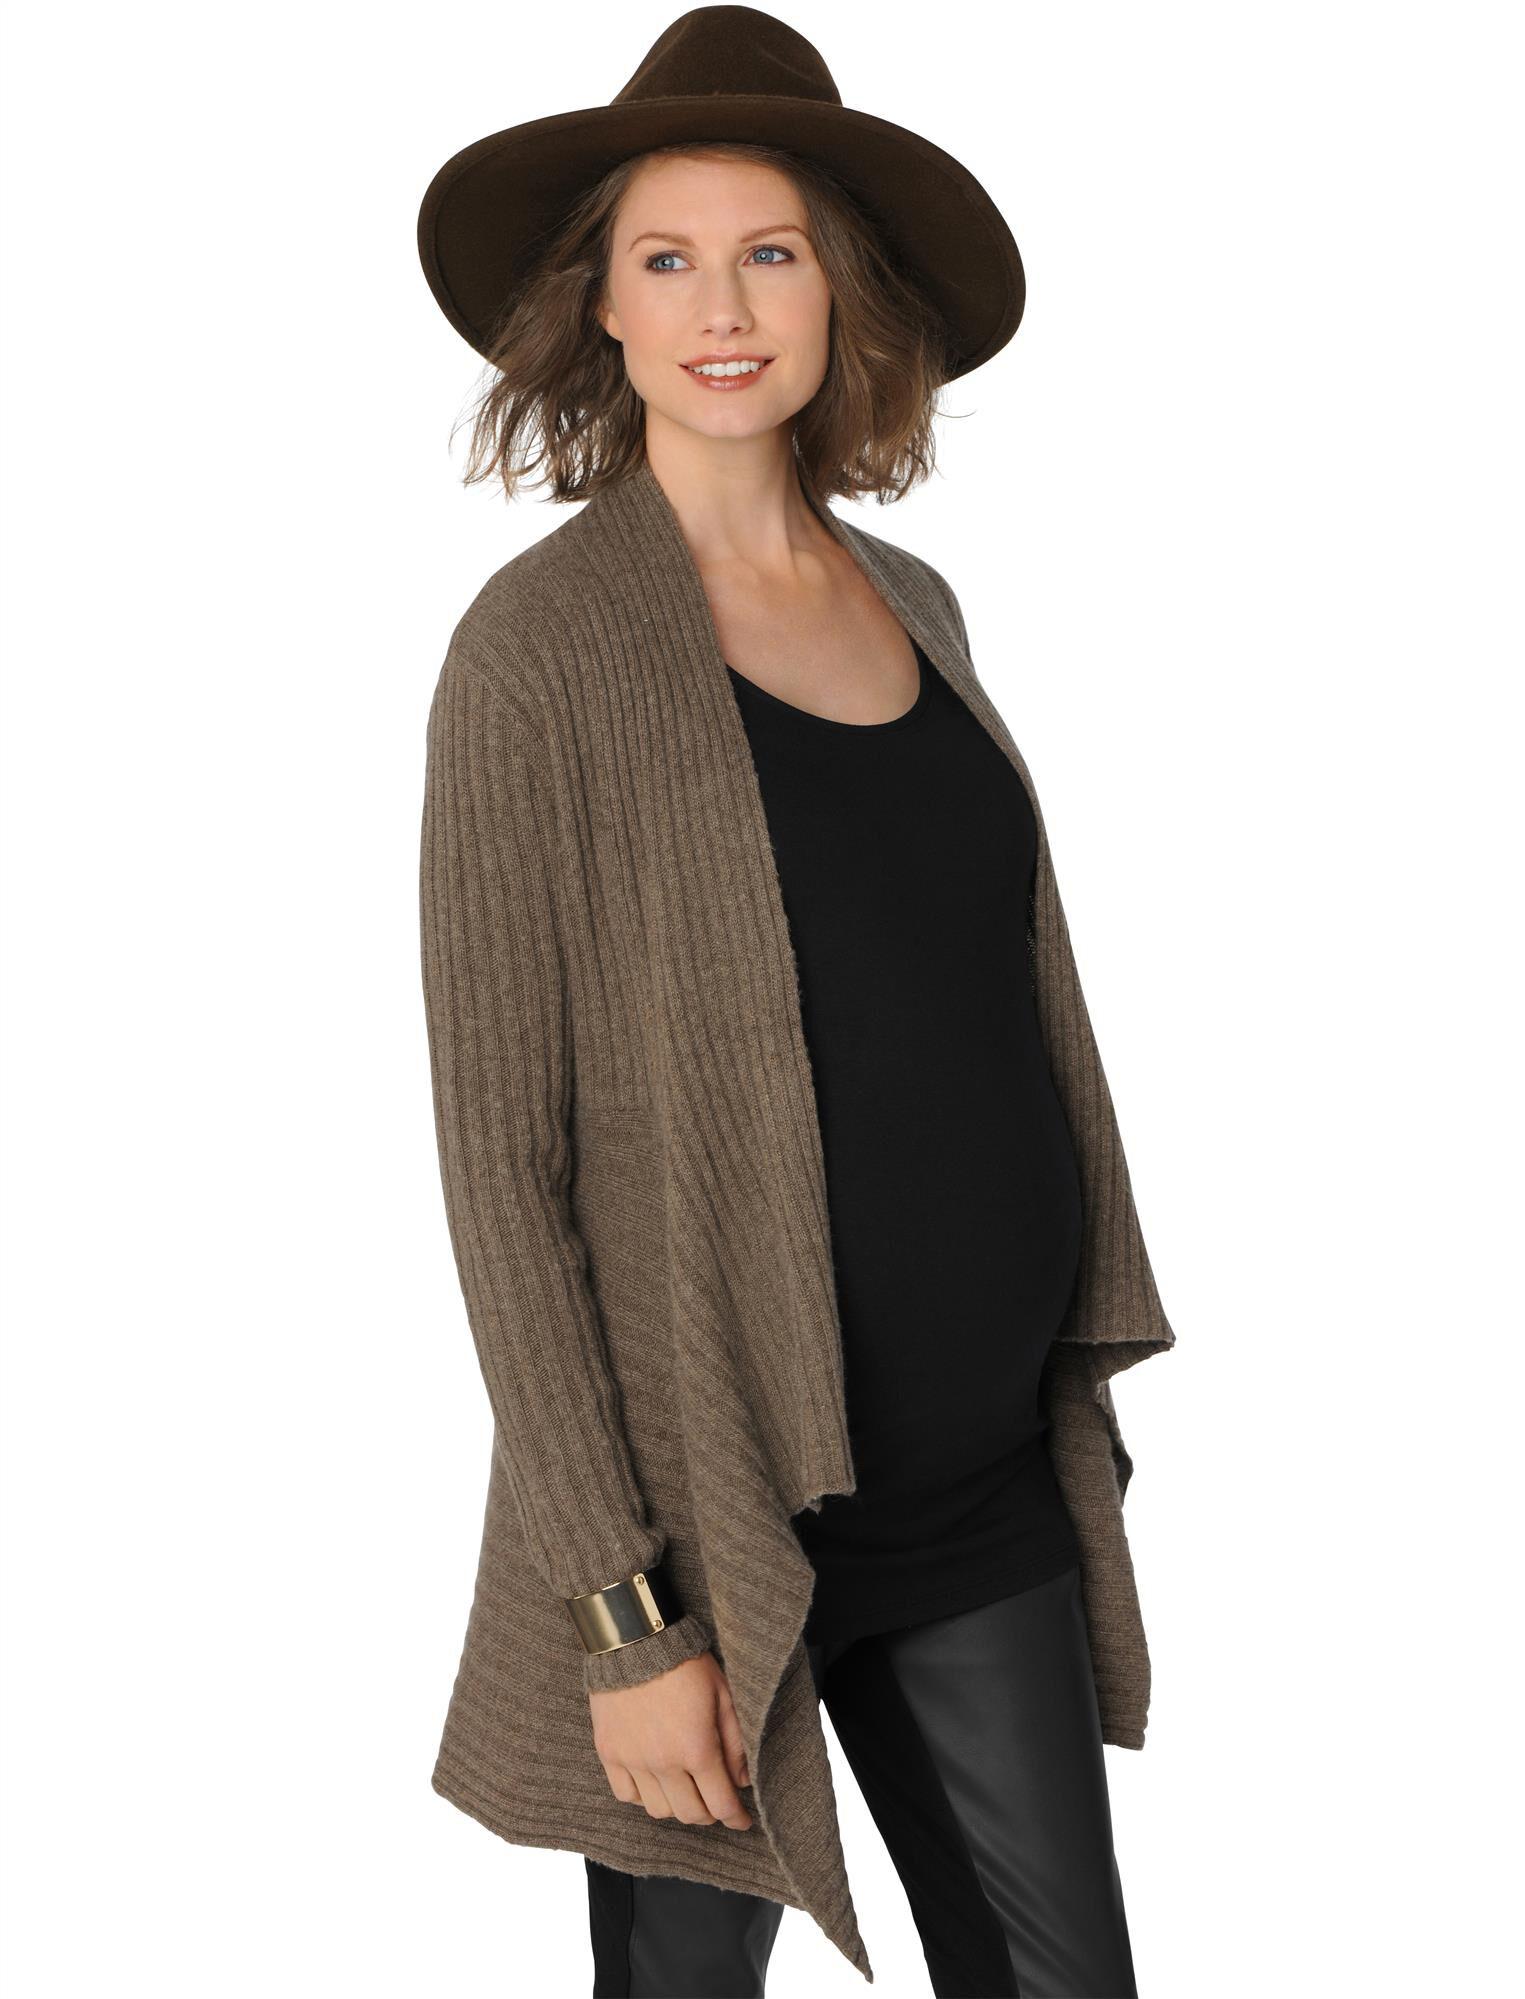 Autumn Cashmere Rib Knit Maternity Cardigan